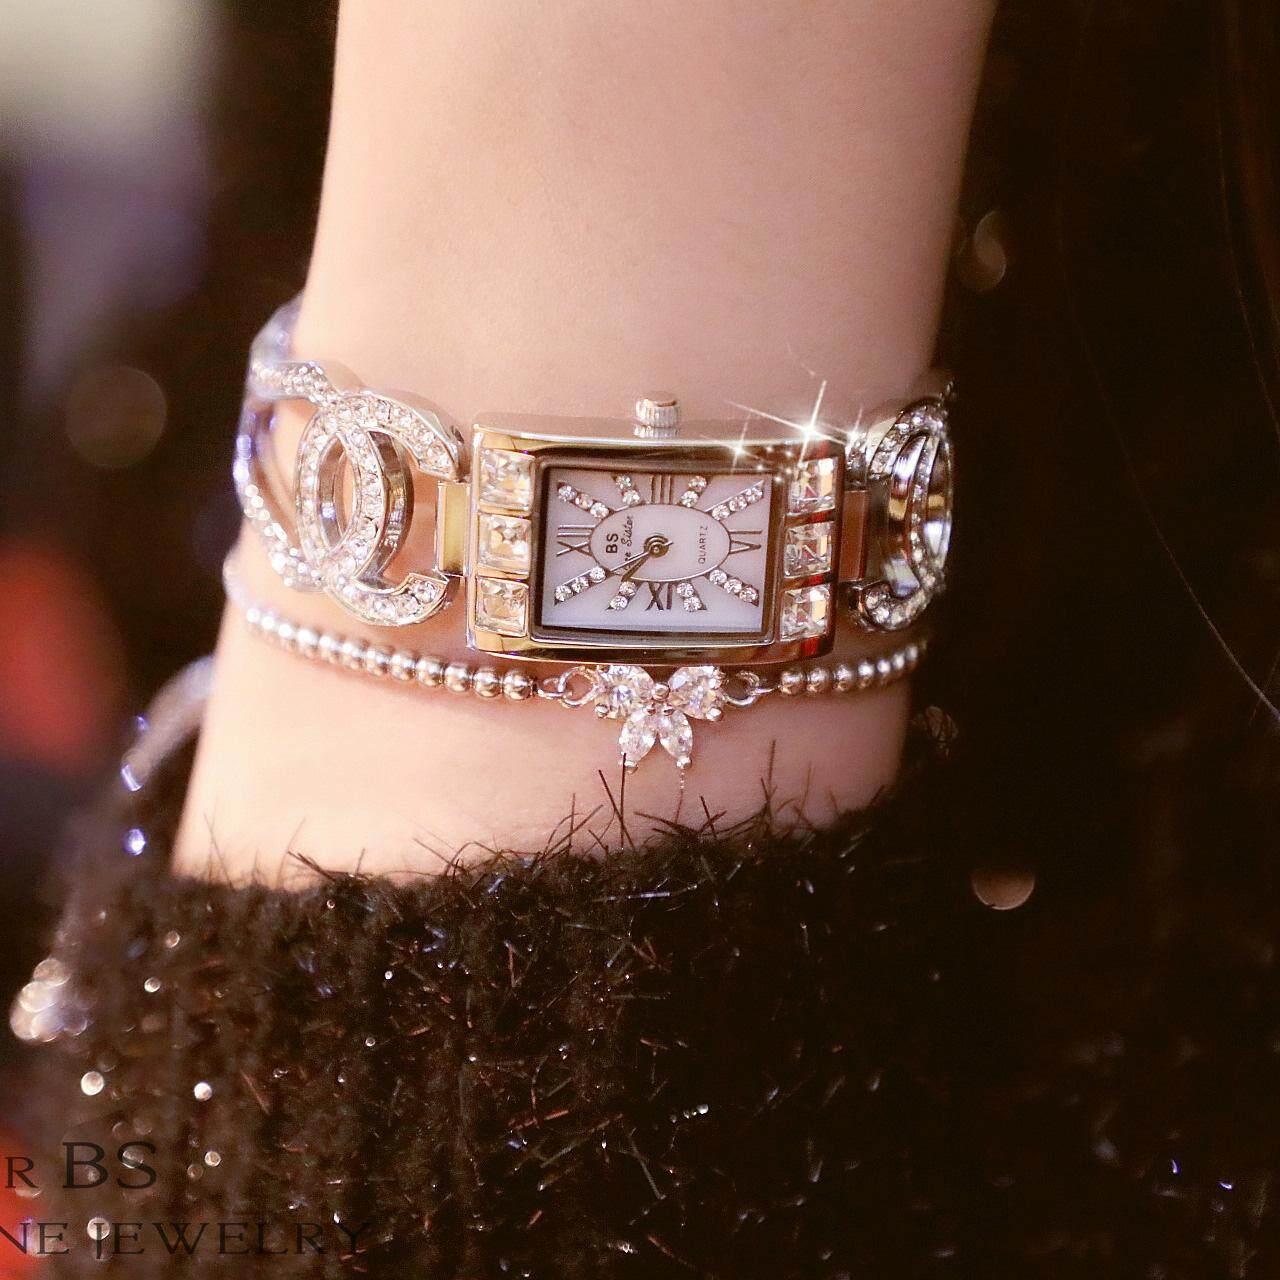 BS new watch high-end bracelet watch full diamond ladies watch luxury watch square watch+Gift Box Malaysia